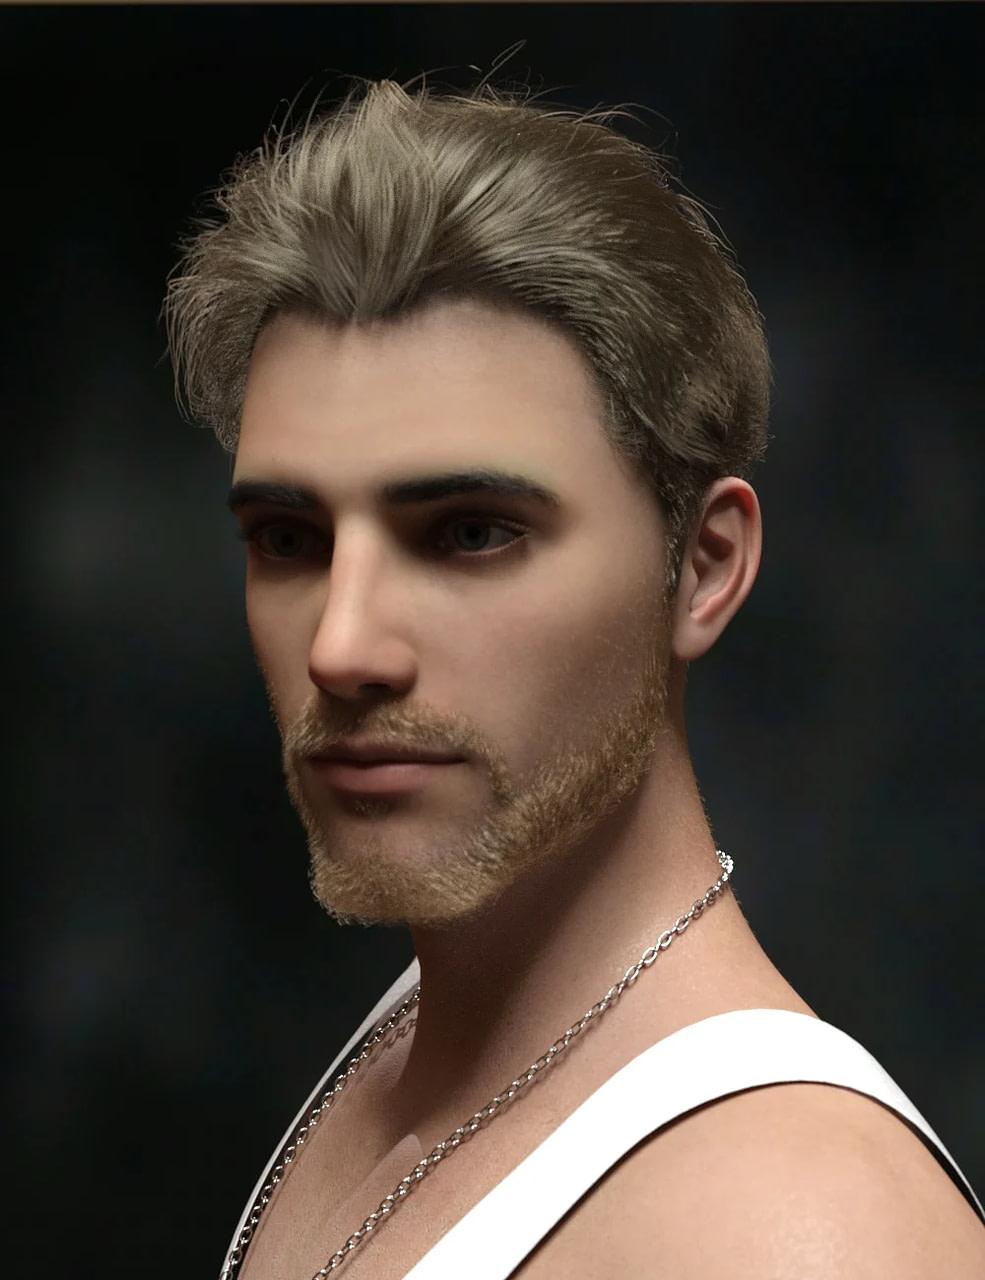 daz studio yoan mature hair and beard